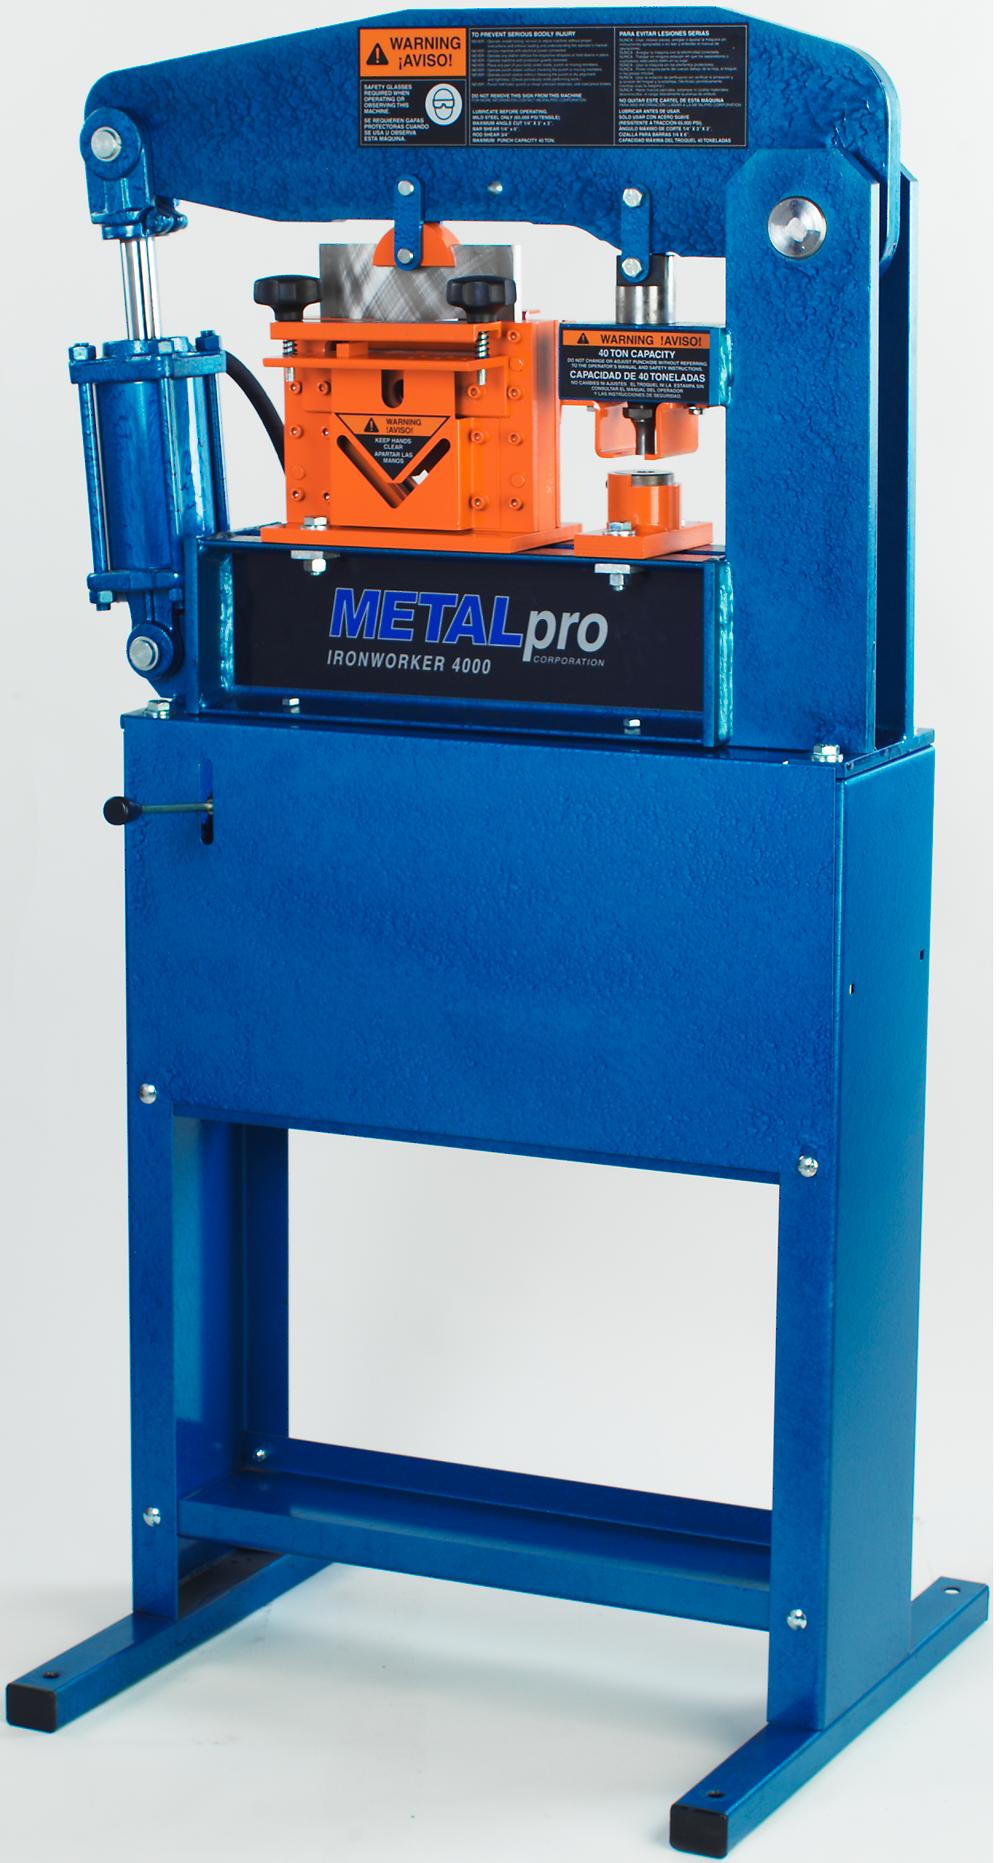 MetalPro 40 Ton Ironworker MP4000